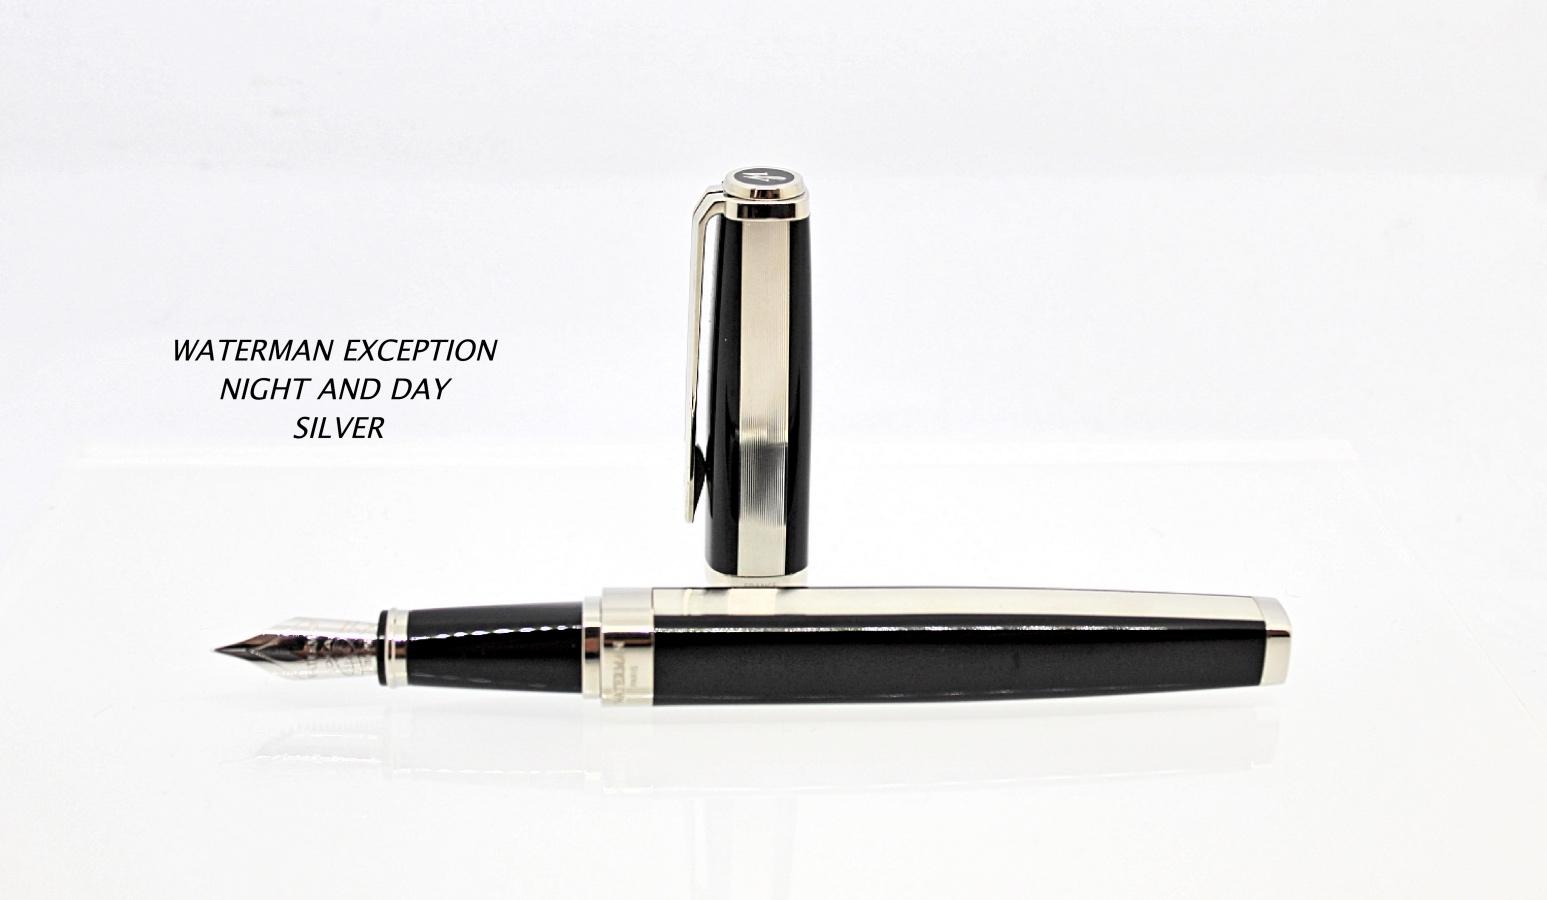 https://www.lastilograficashop.it/it/prodotto/penna-stilografica-waterman-exception-night-day-silver/